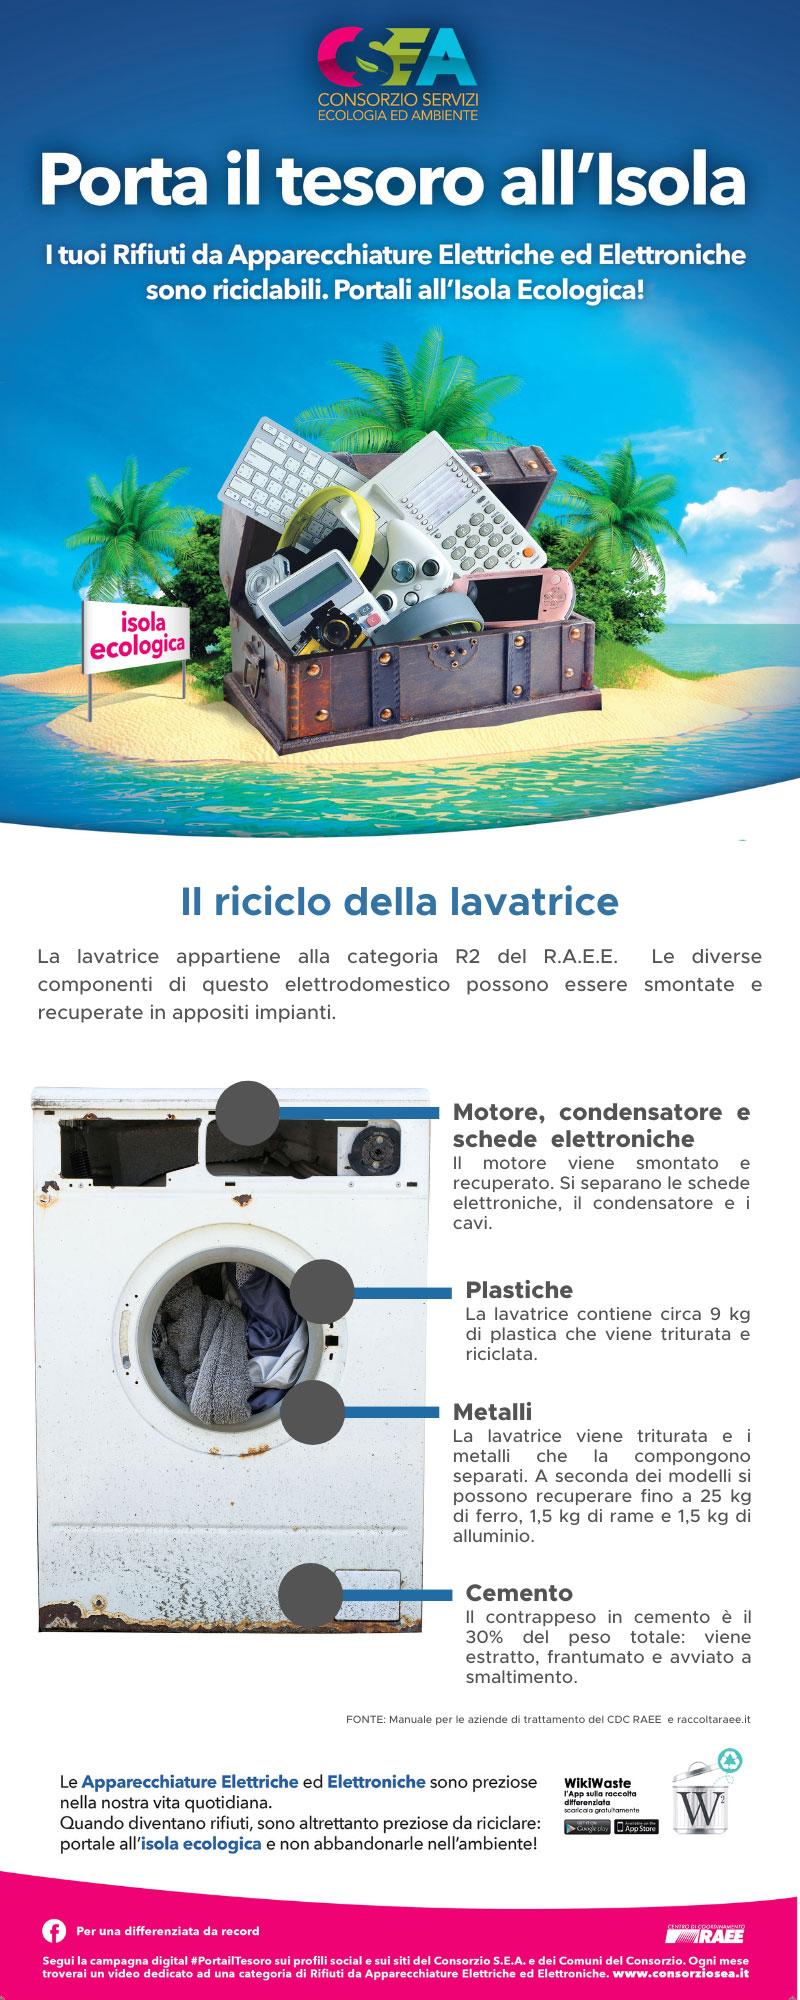 raee-lavatrice